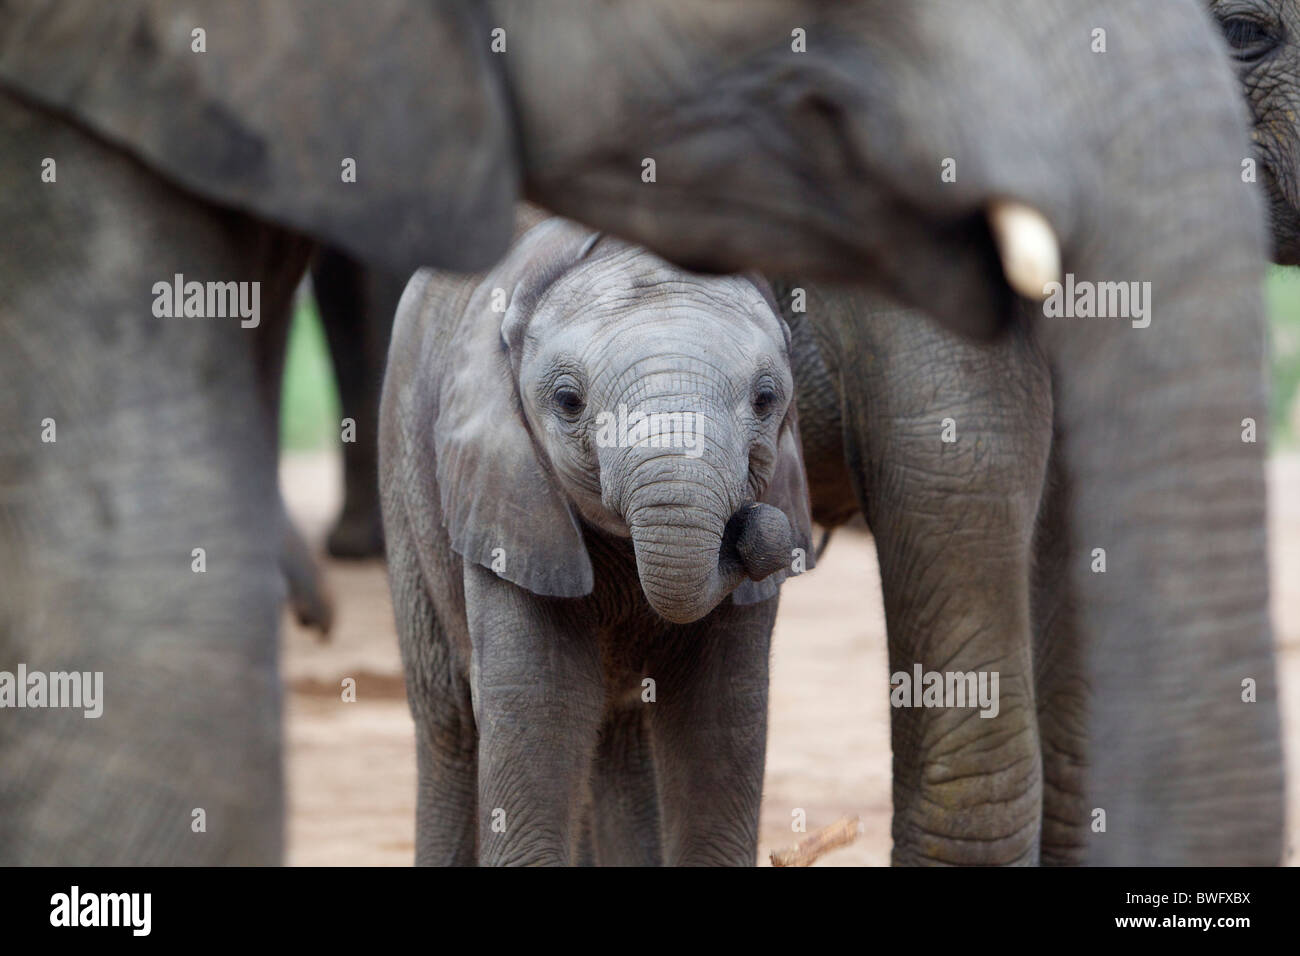 Madre con bambino elefante africano (Loxodonta africana), il Parco Nazionale Kruger, Mpumalanga Provincia, Sud Africa Immagini Stock